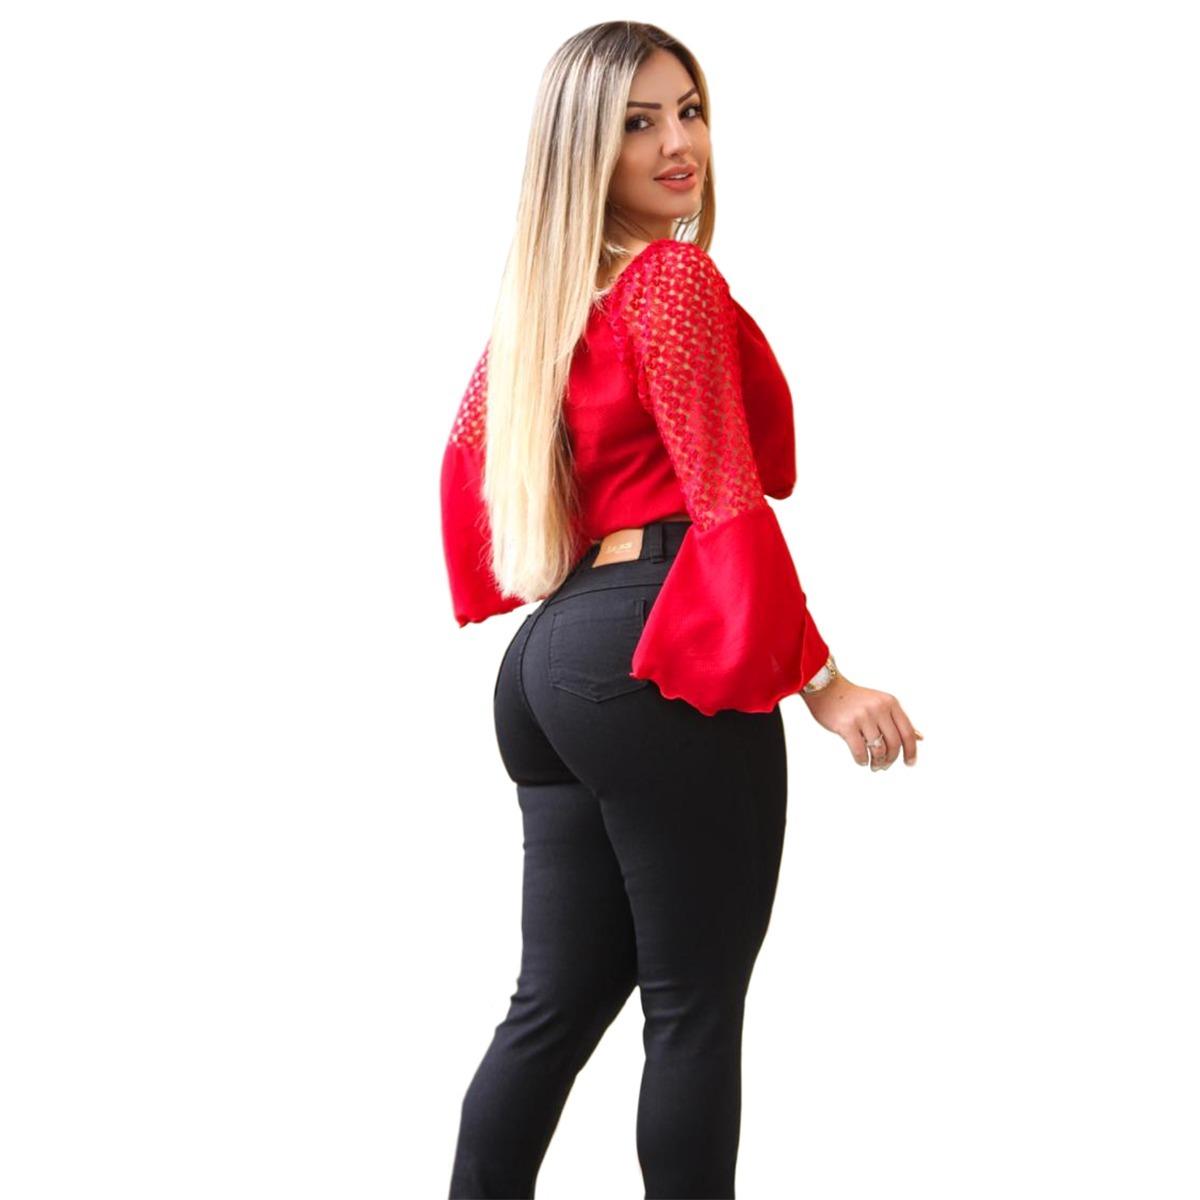 2d33ada50 calças jeans plus size feminina cintura alta linda 48 50 52. Carregando  zoom.